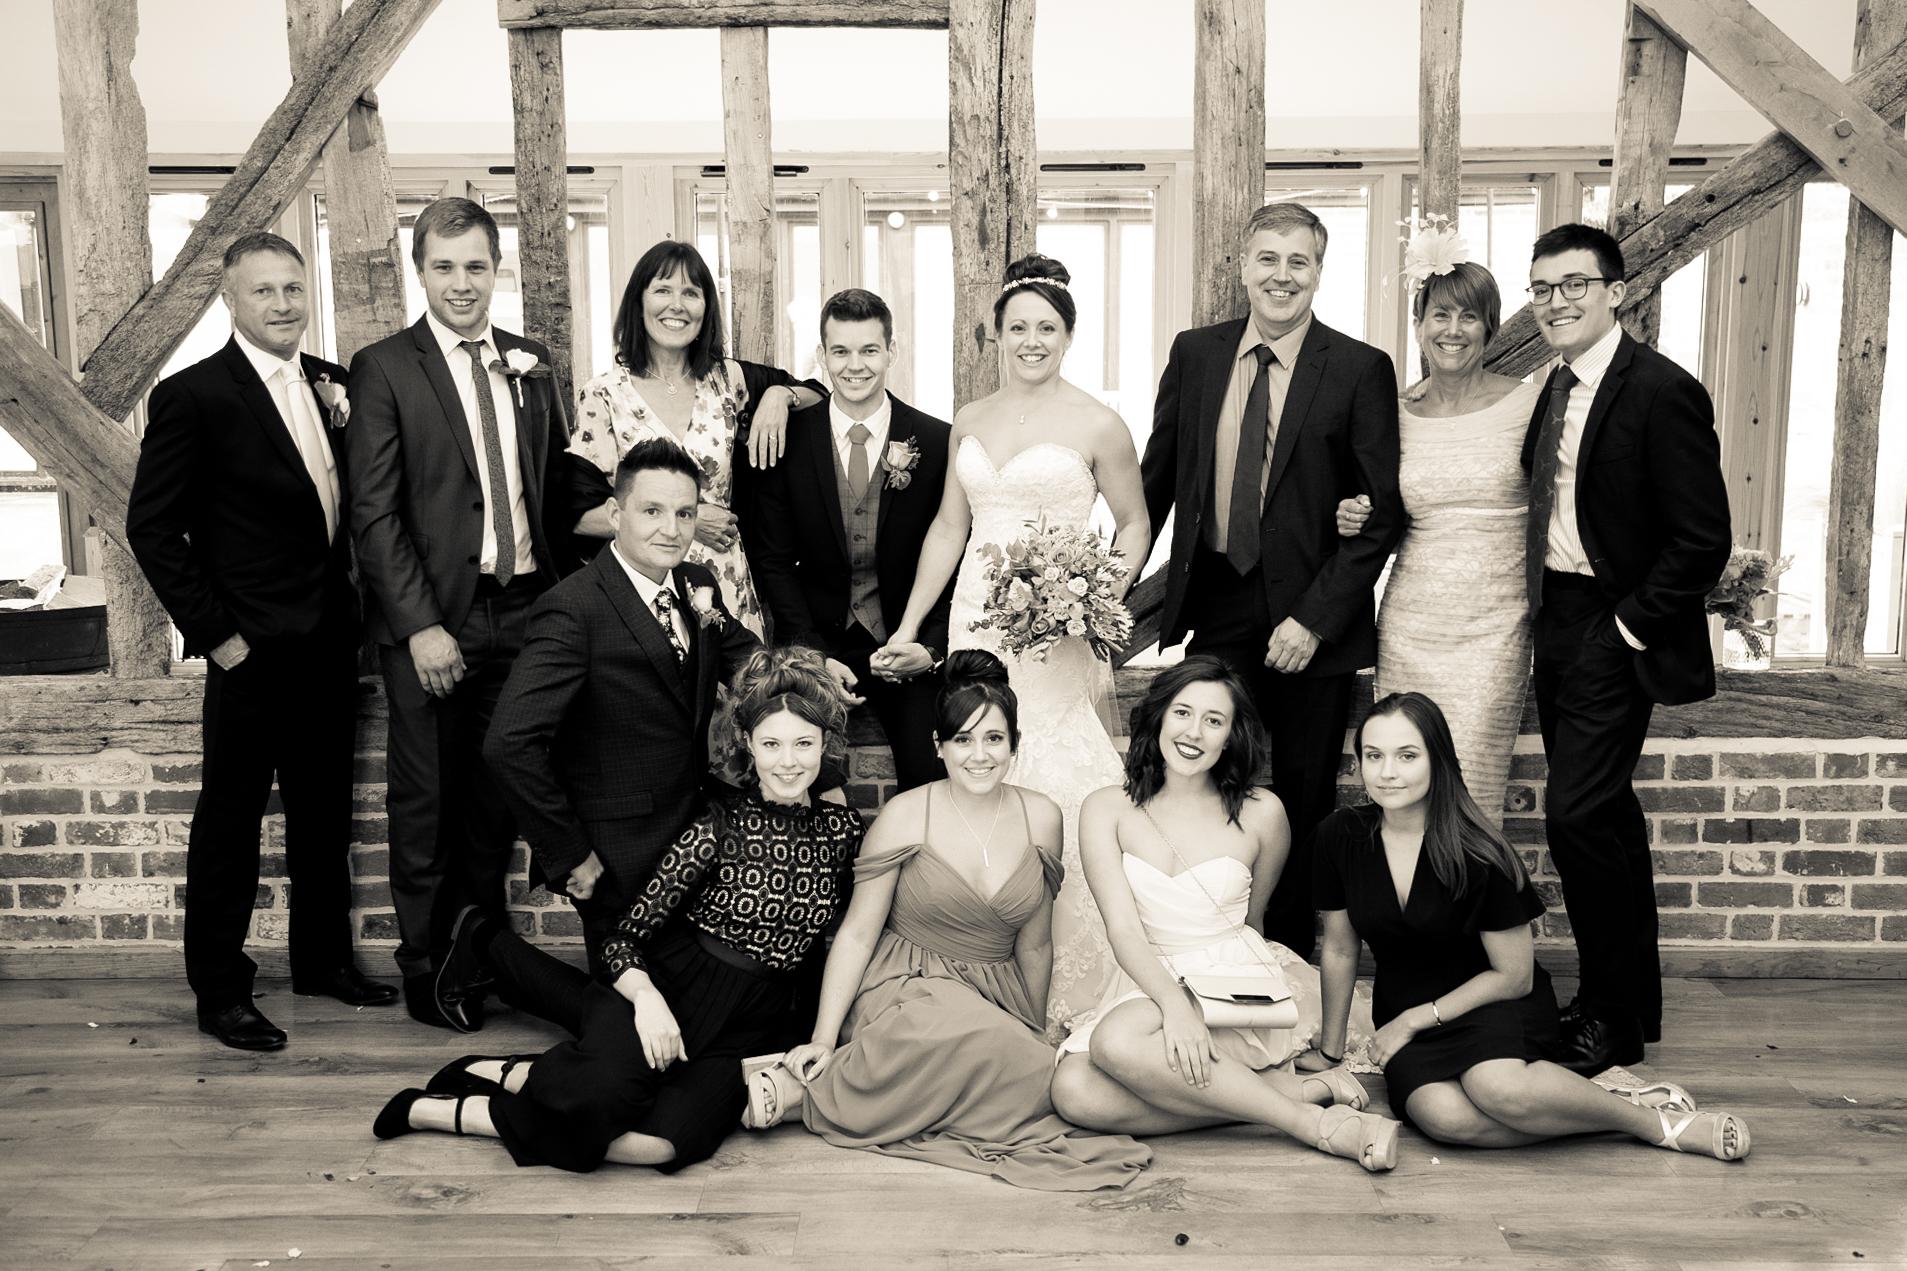 Lou, Jonny, Farrs and Mum and Co.jpg